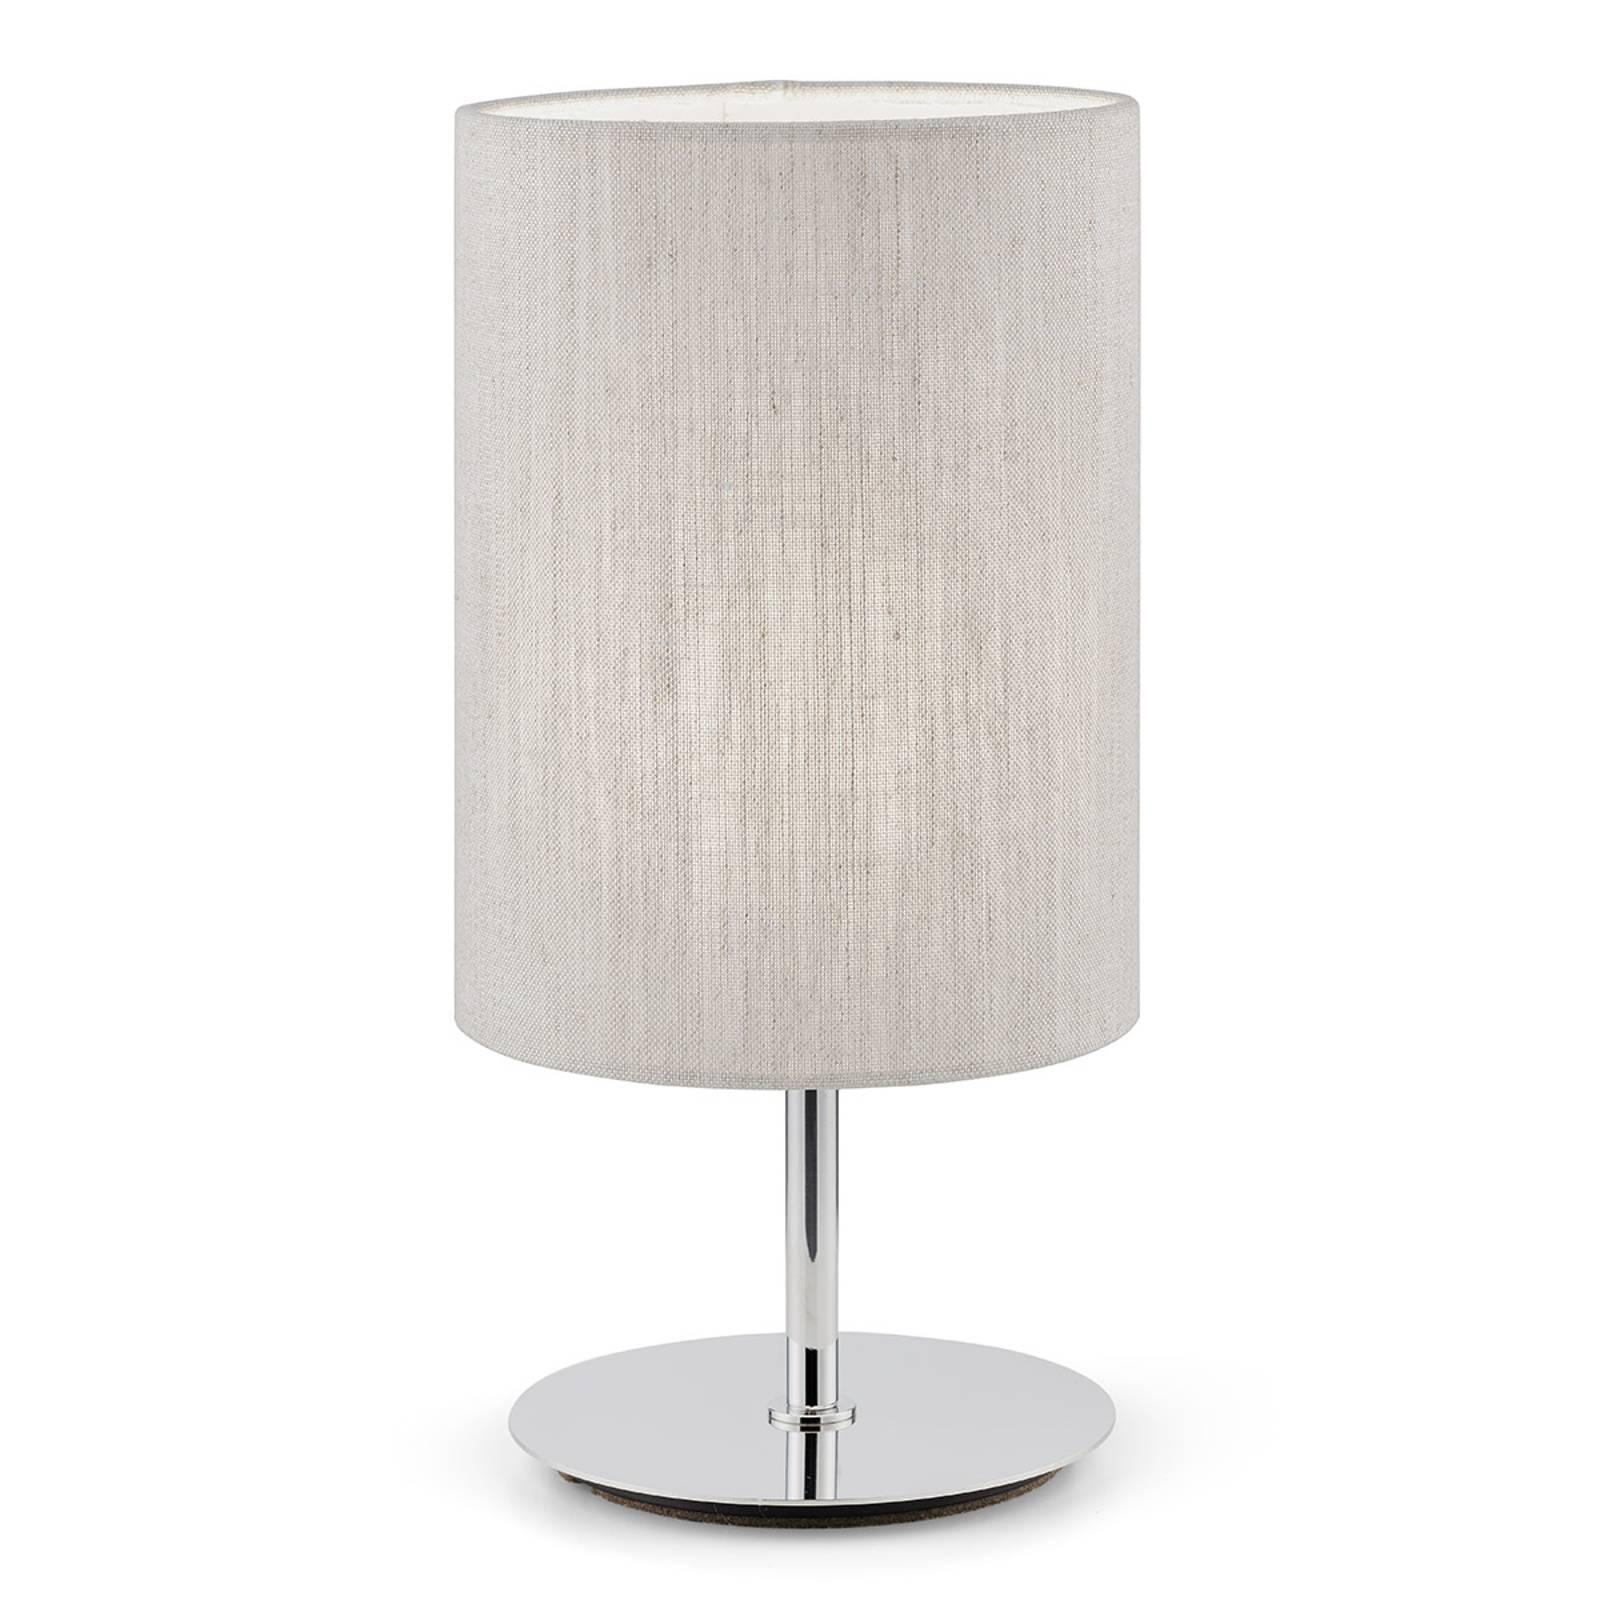 Tafellamp Stilo Lumetto ecru